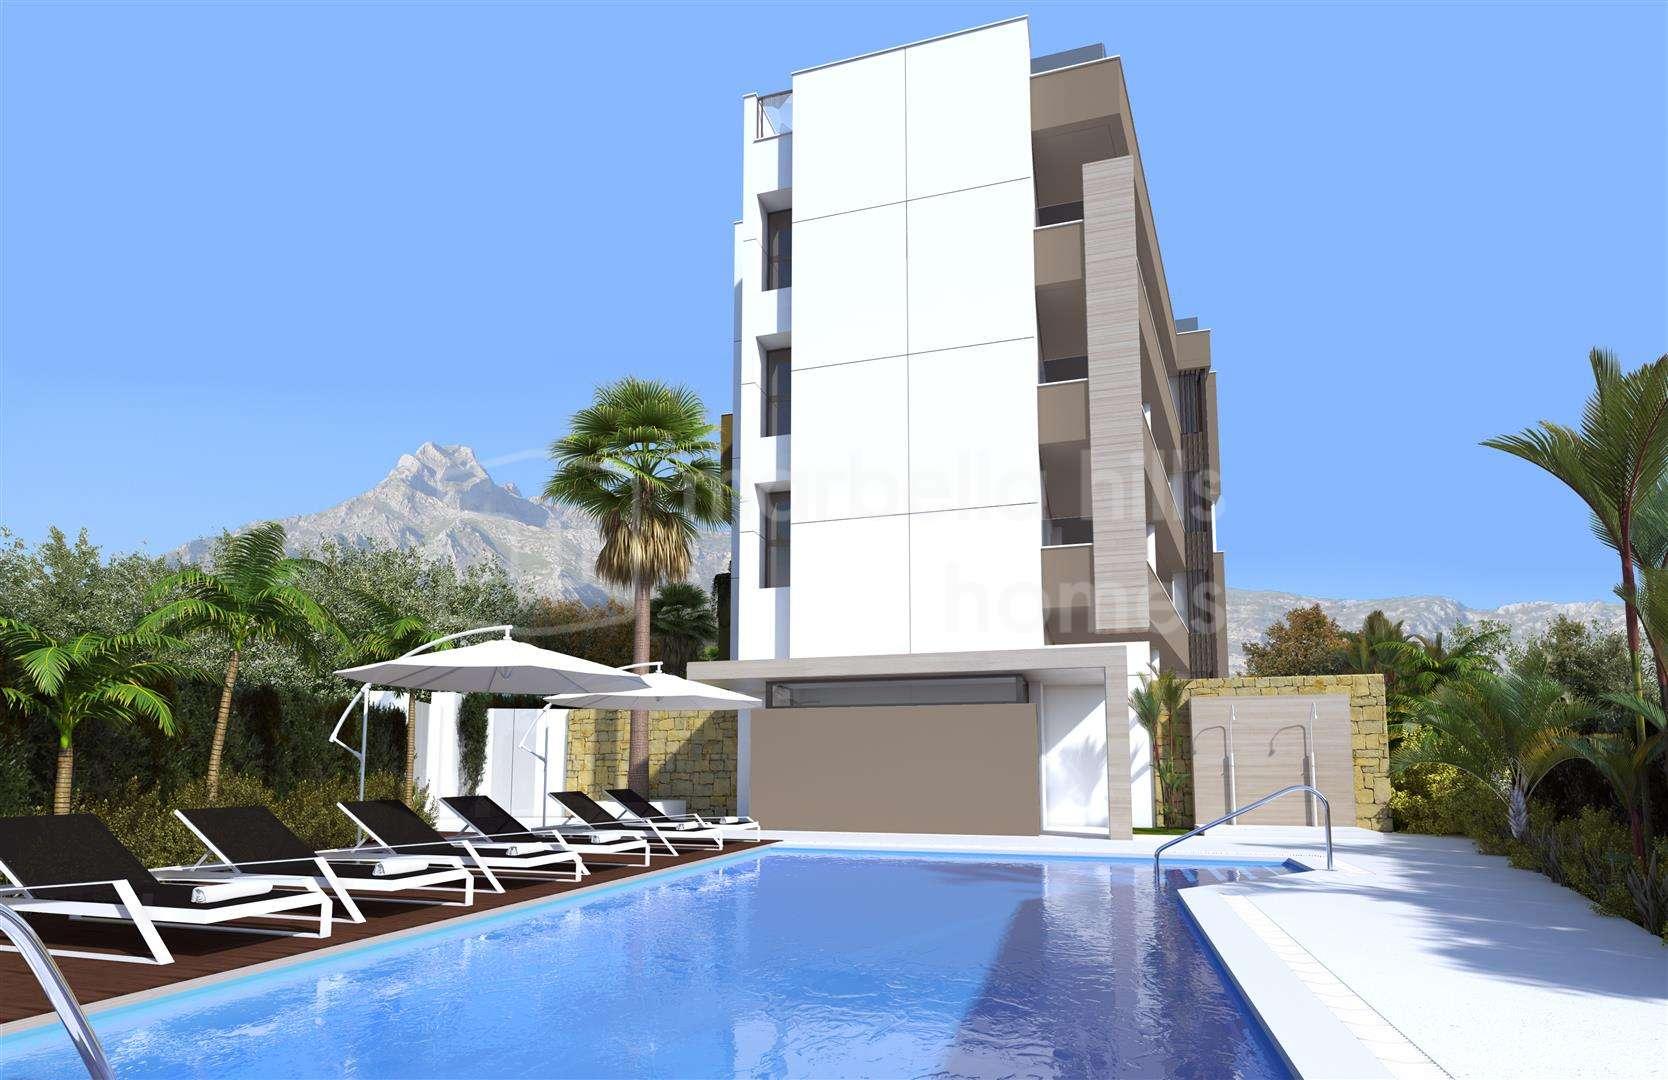 Wohnung Zu Verkaufen In Nueva Andalucia